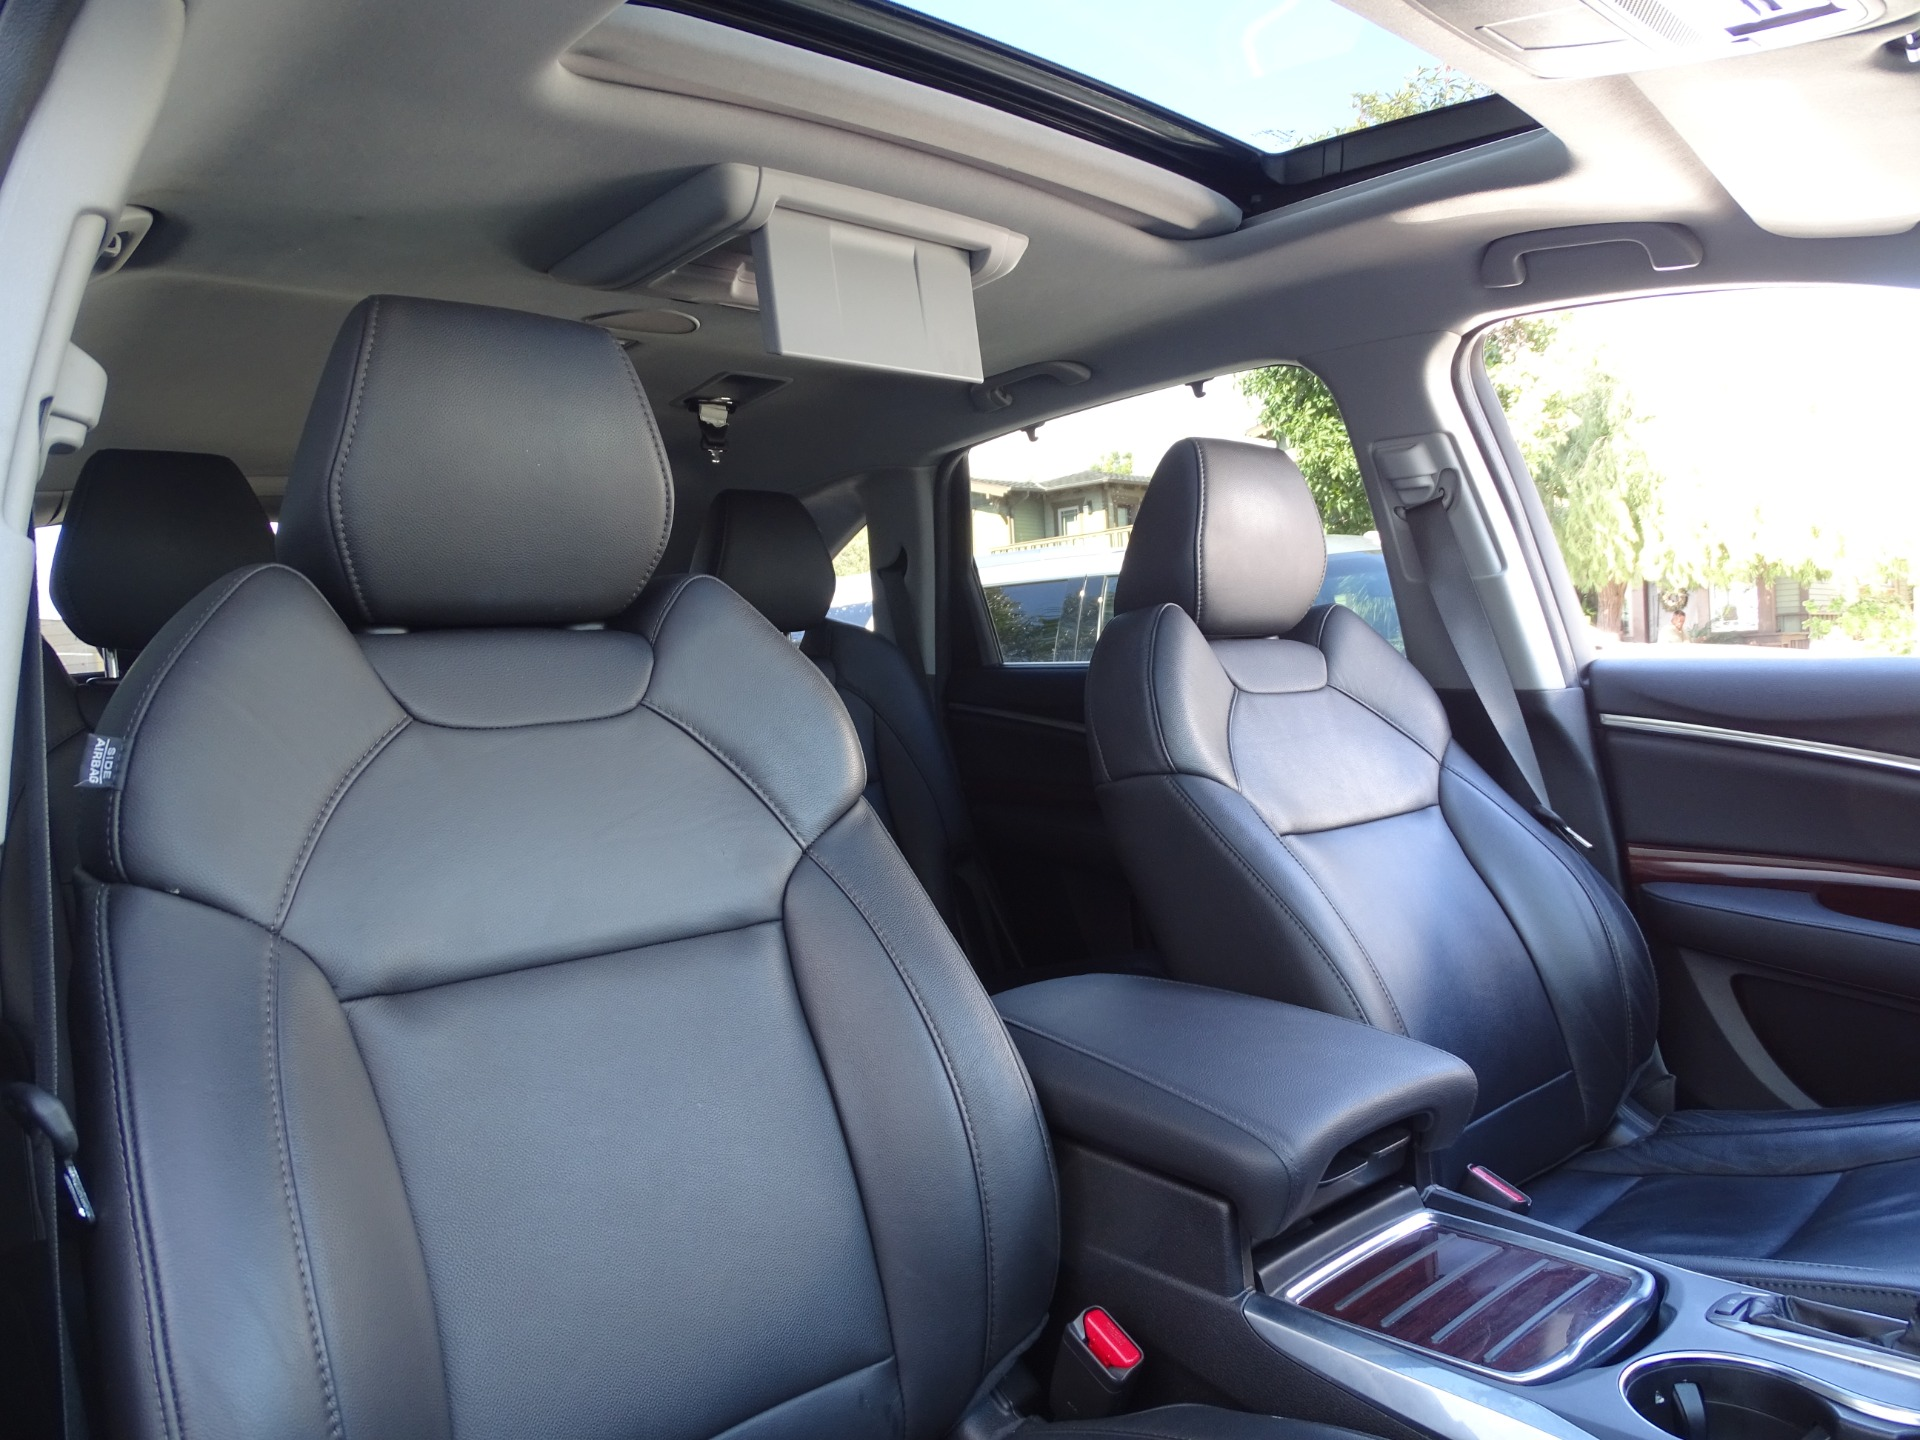 Used-2014-Acura-MDX-SH-AWD